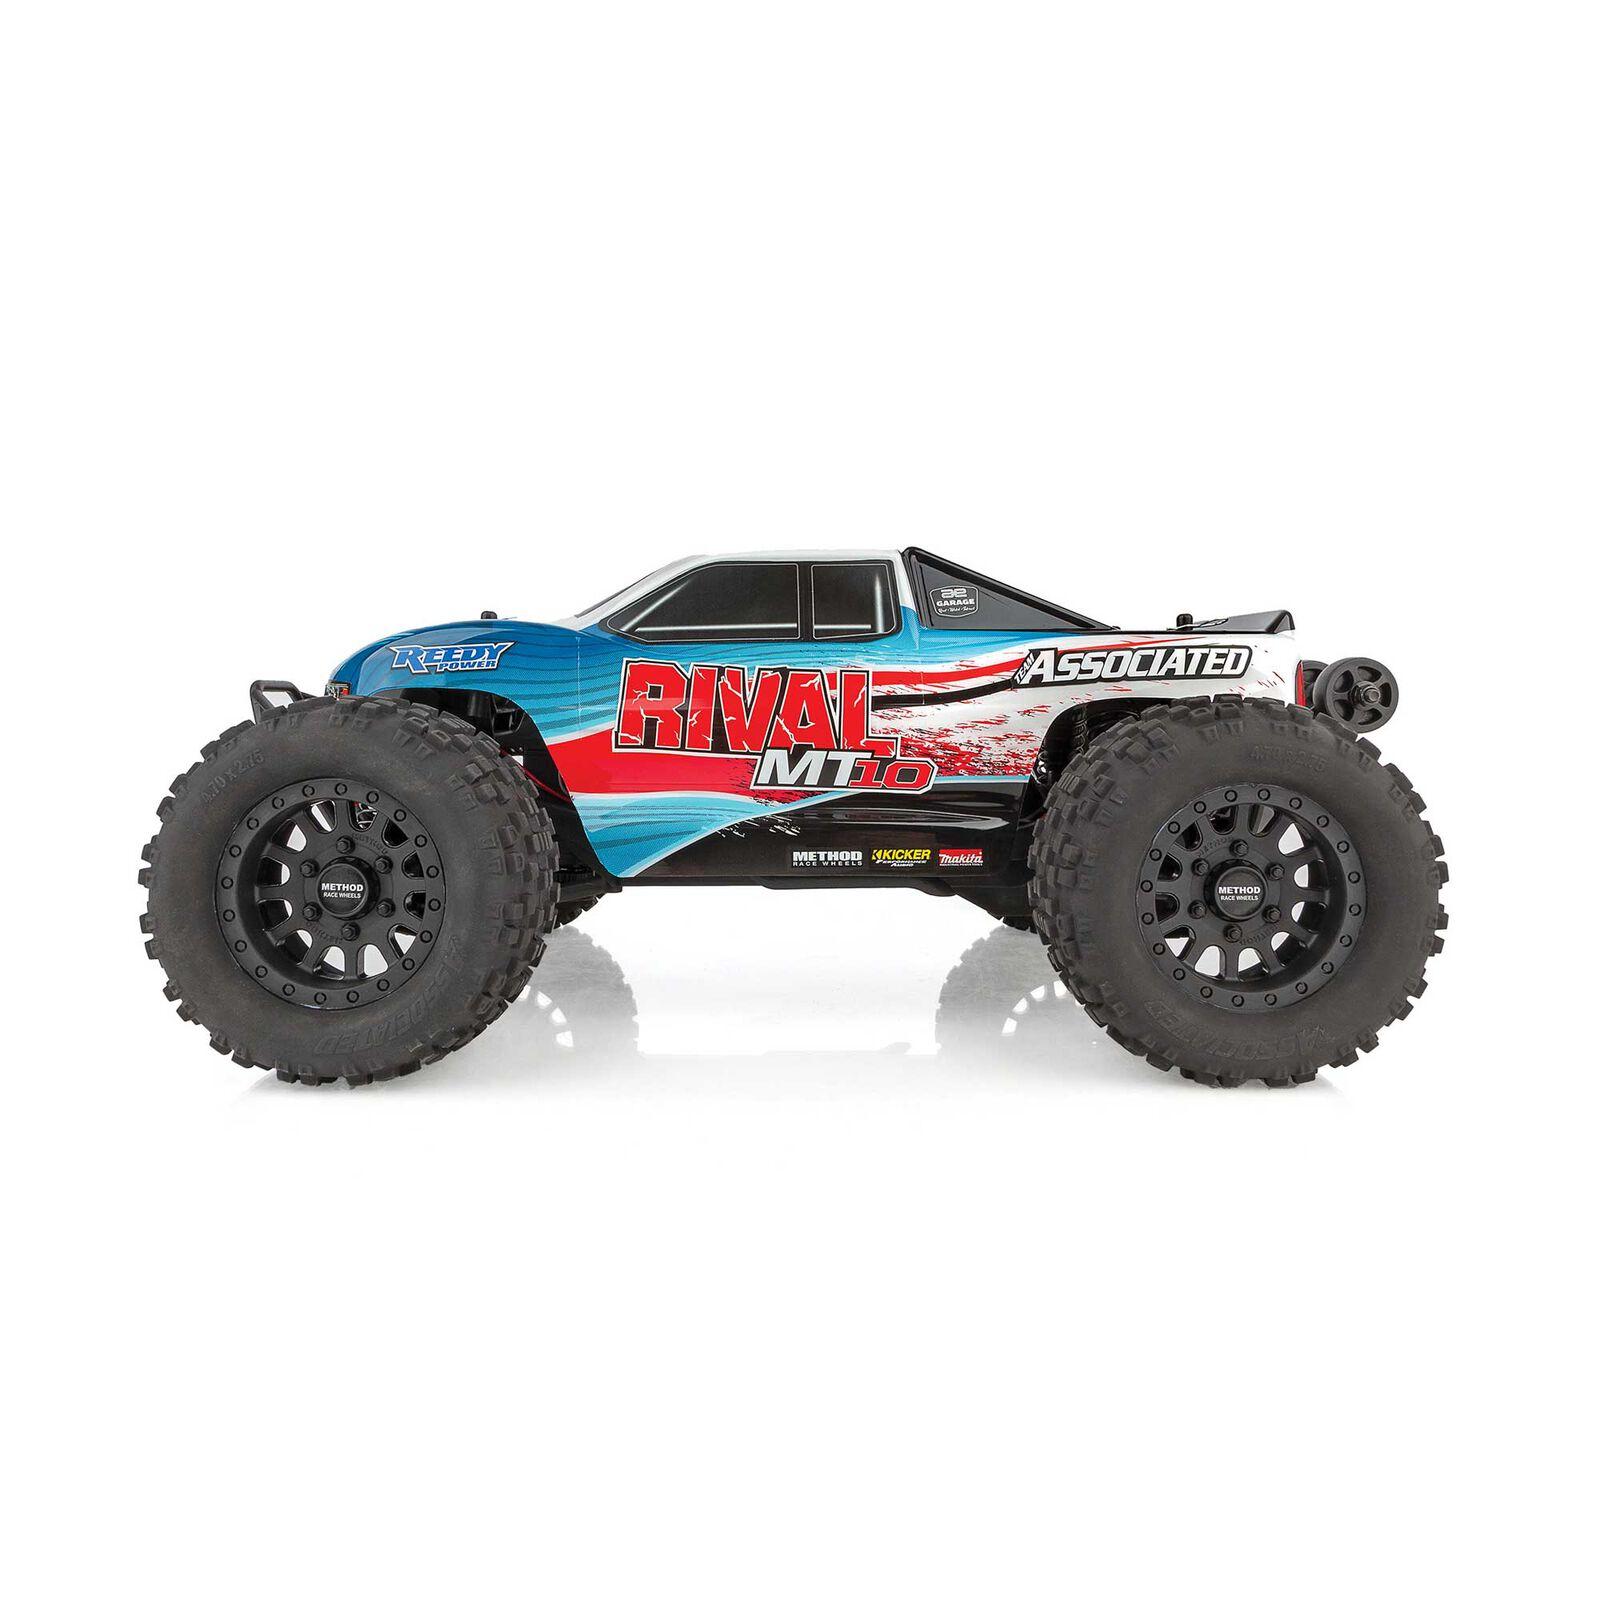 1/10 Rival MT10 4WD Monster Truck Brushless RTR